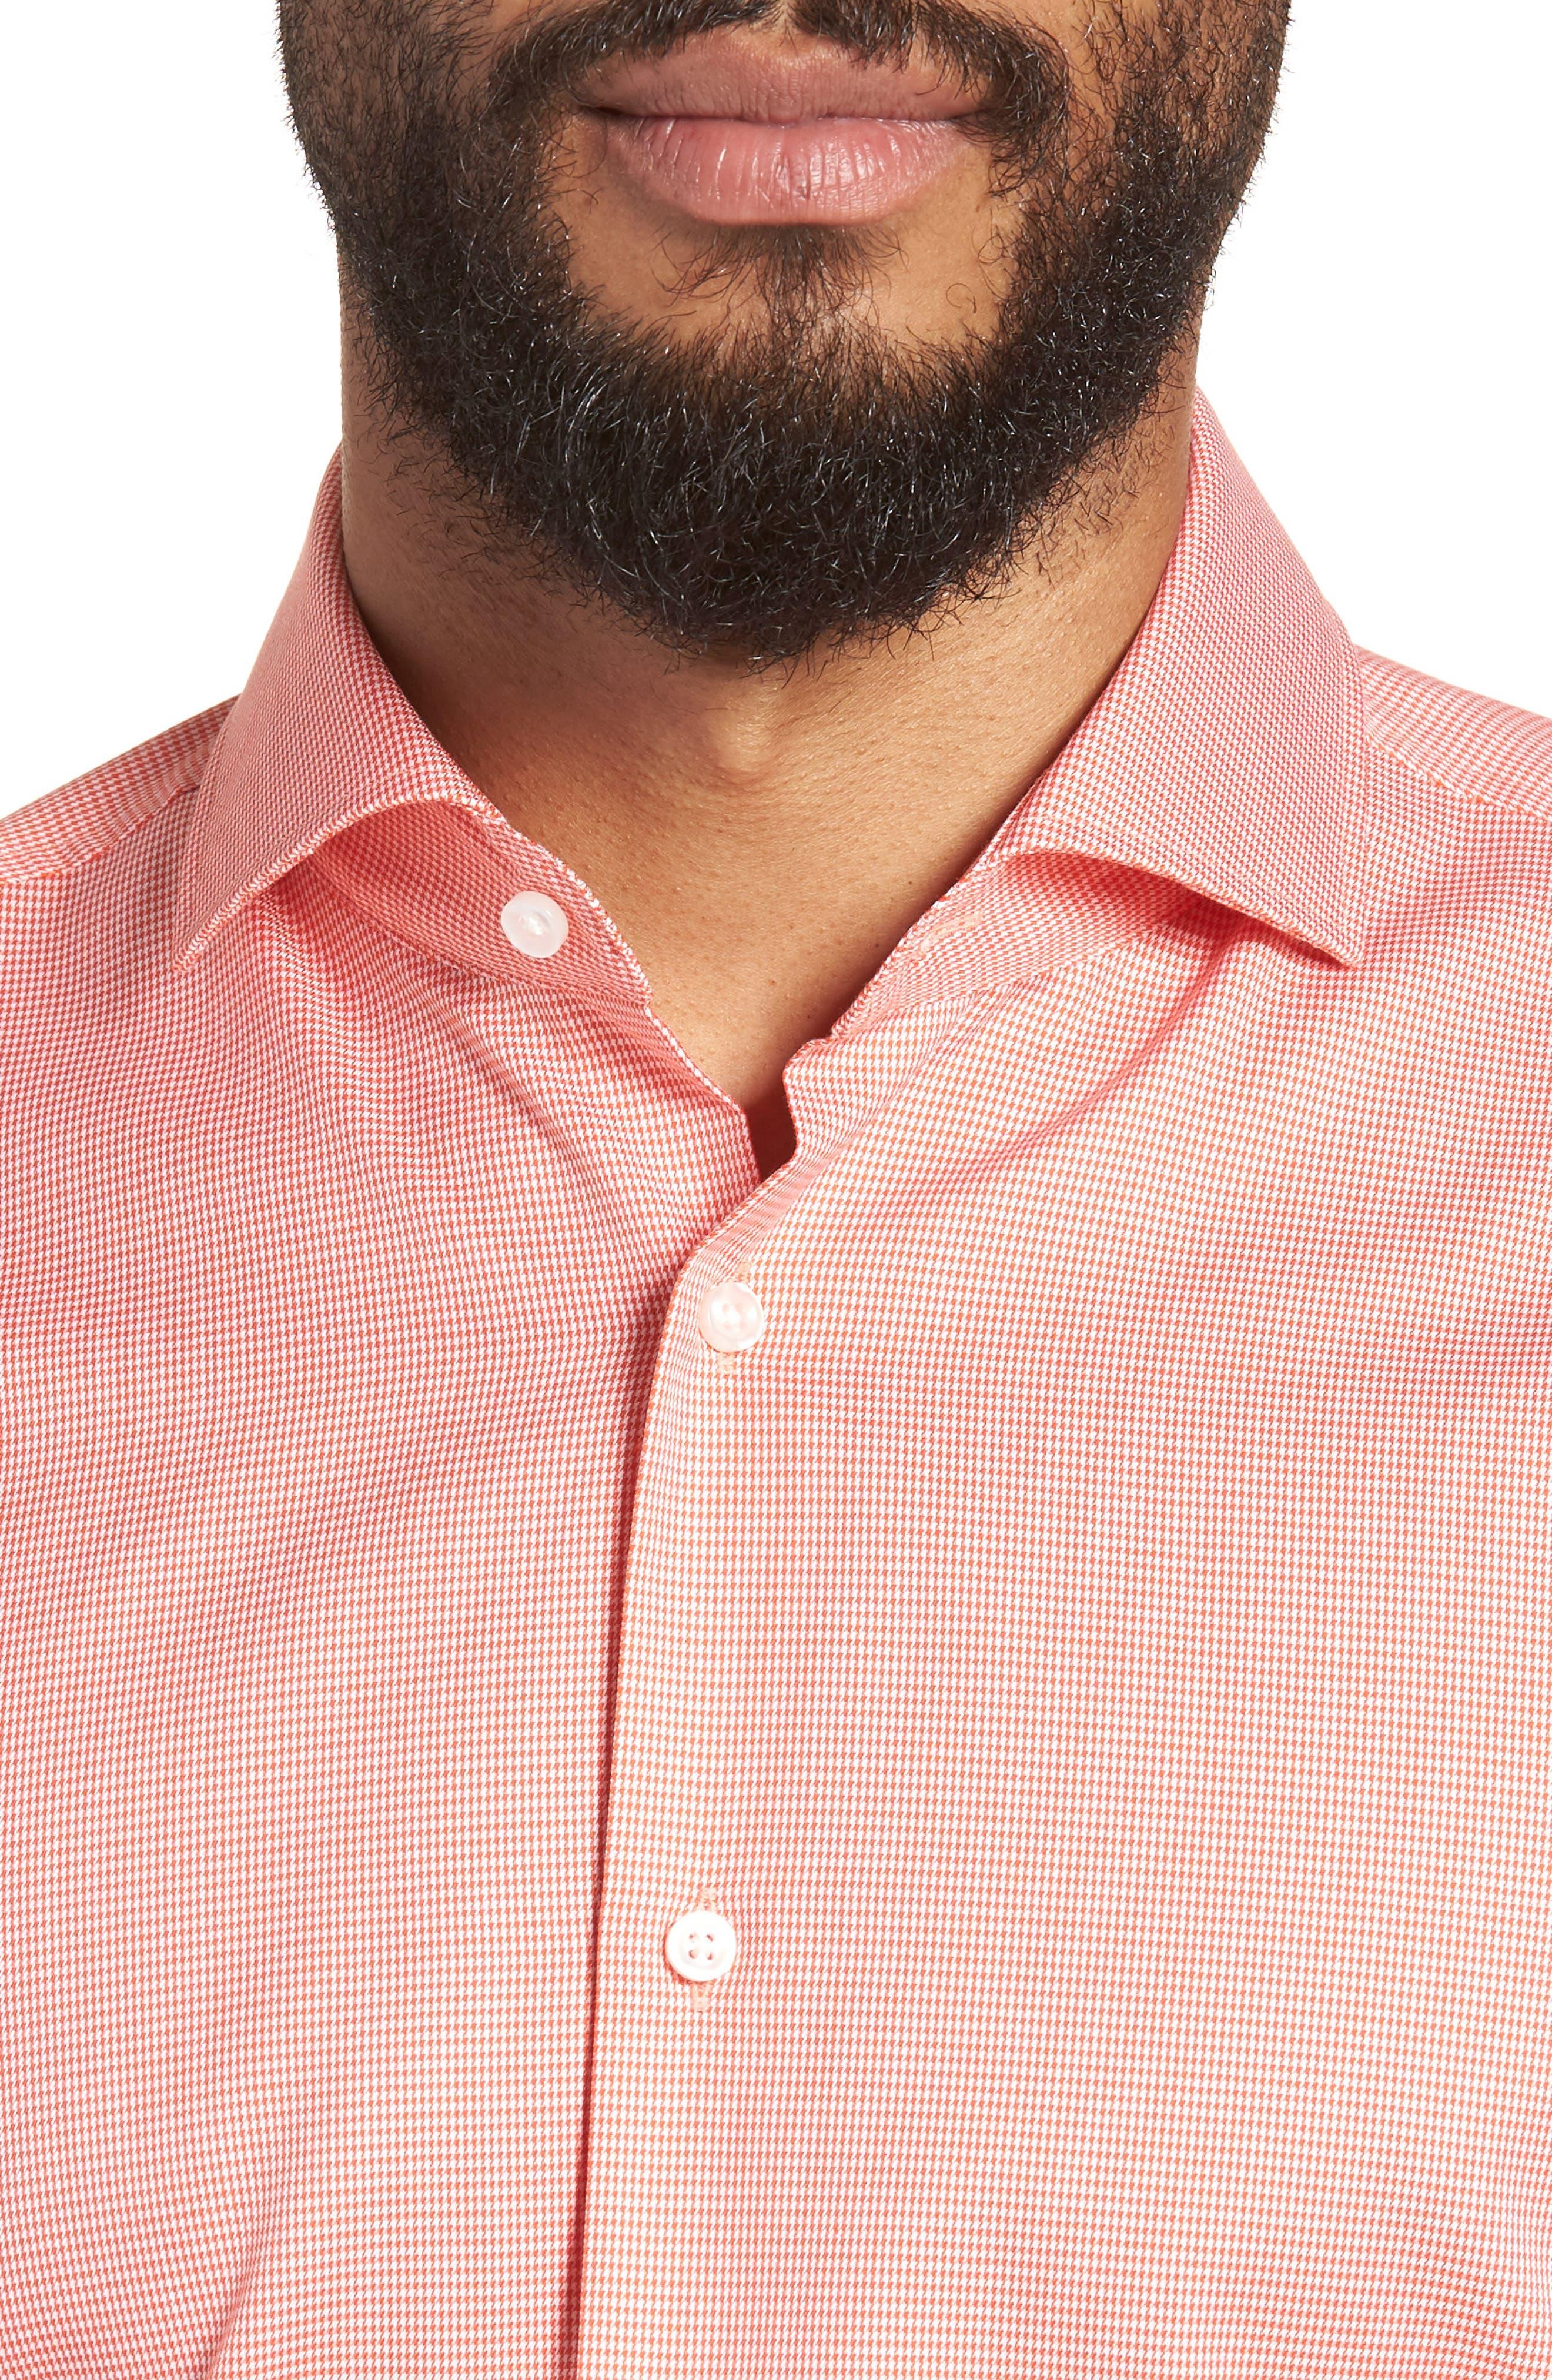 Jason Slim Fit Houndstooth Dress Shirt,                             Alternate thumbnail 2, color,                             813